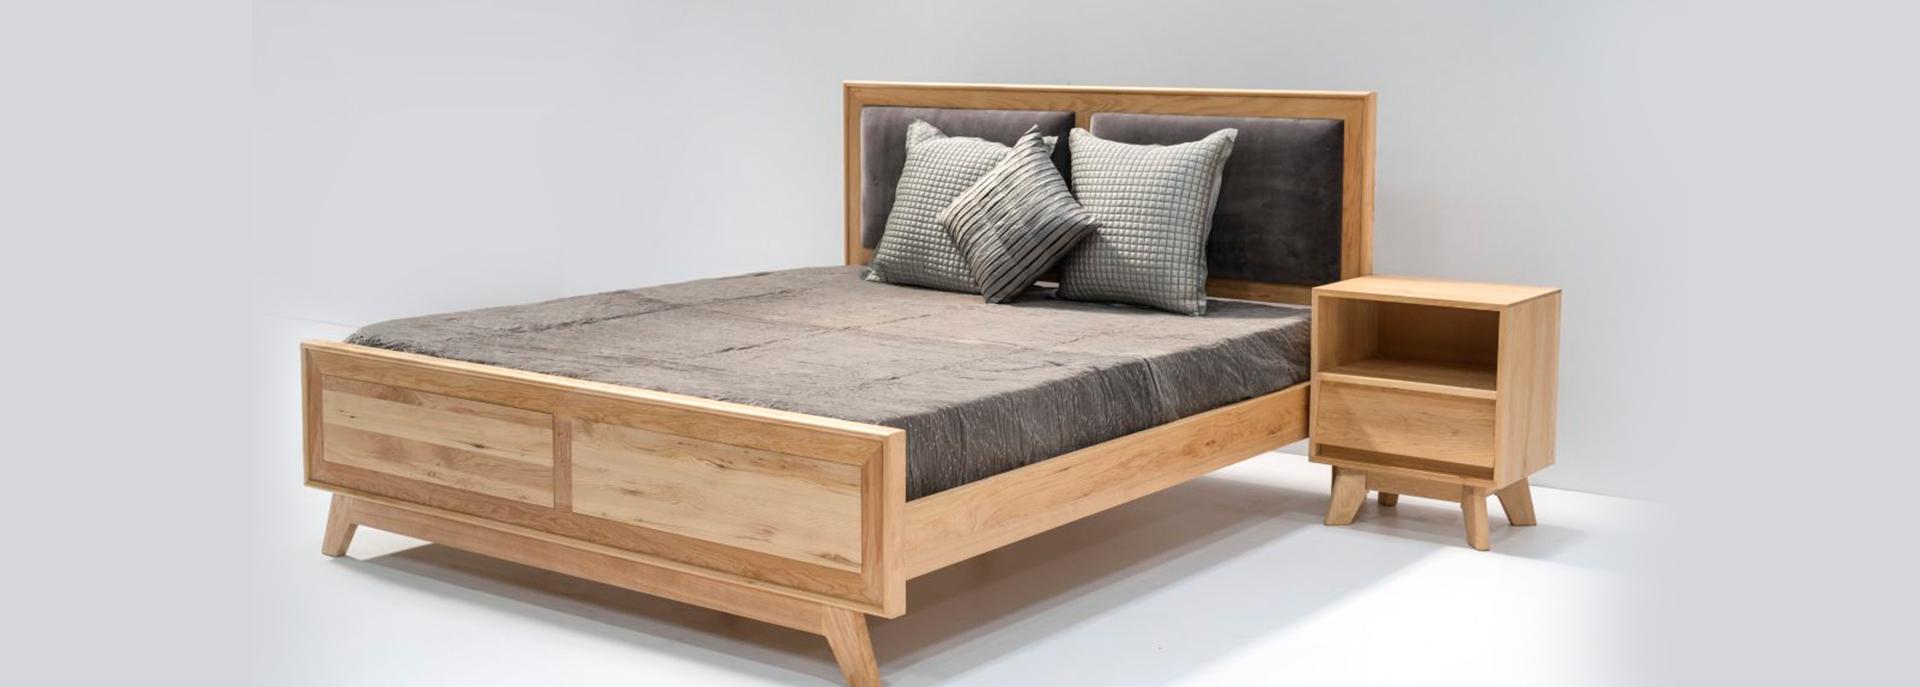 Furniture banner 2 - Canadian Wood